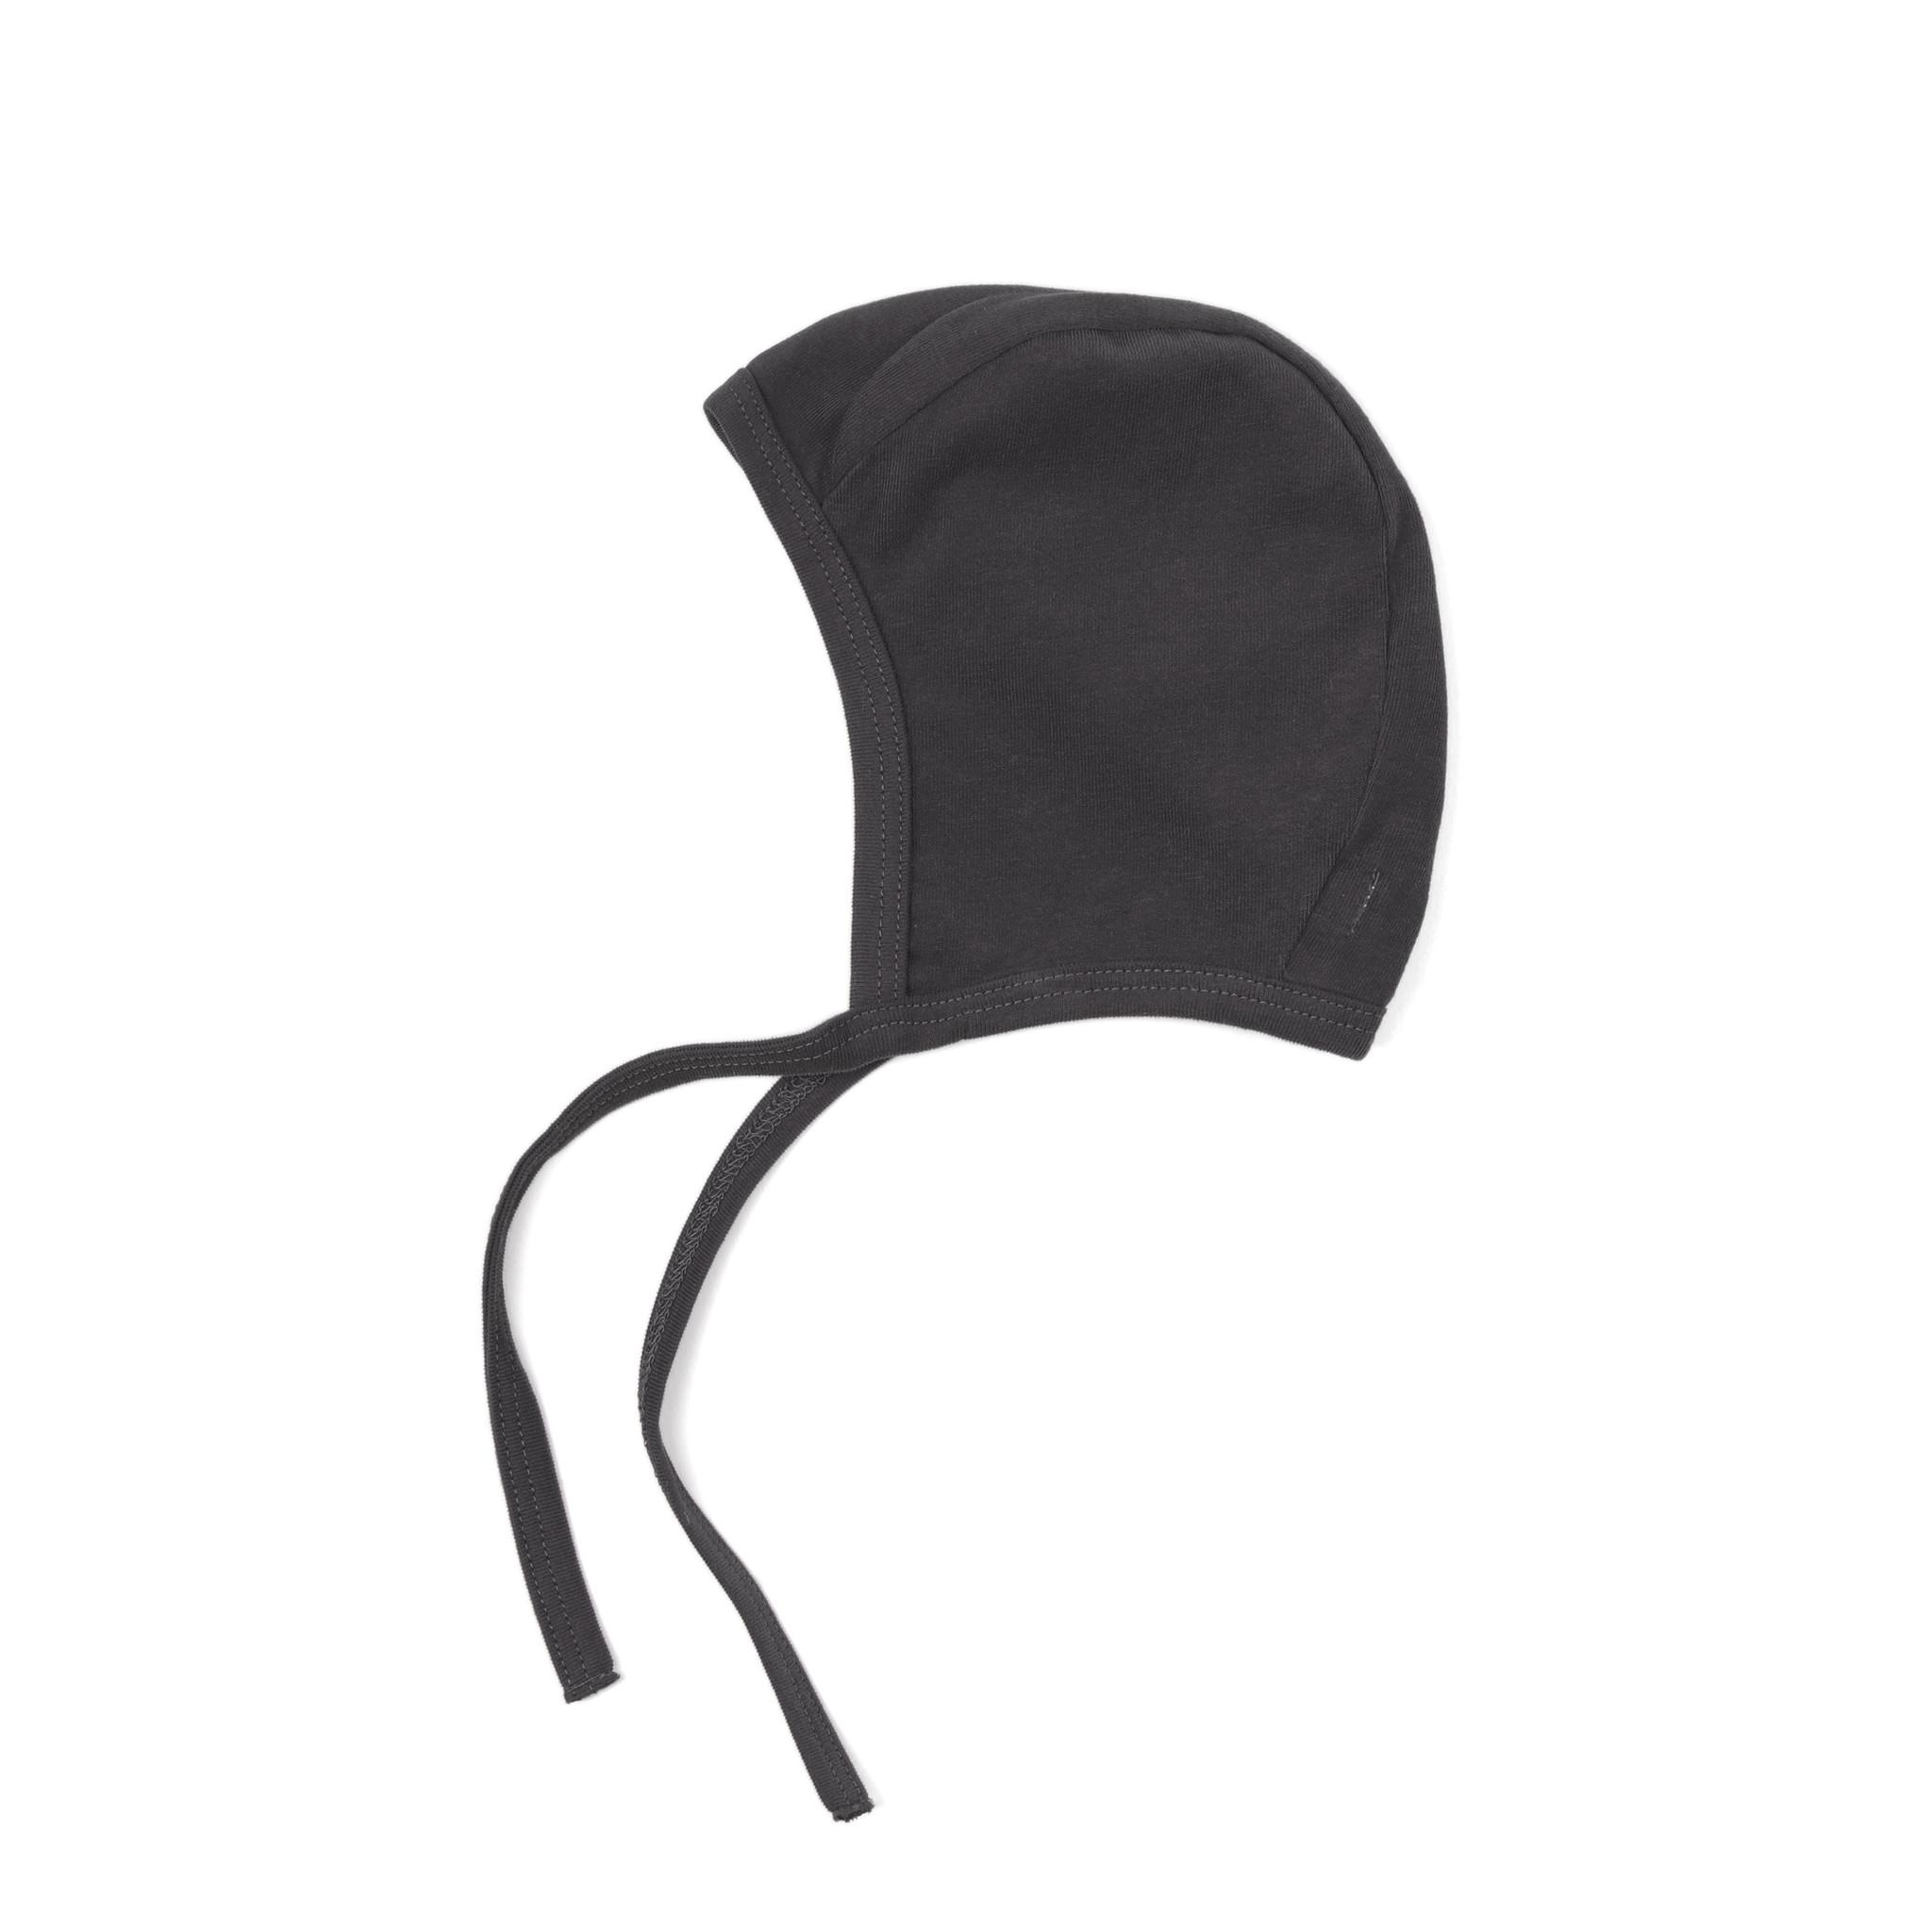 Baby bonnet - Graphite-1